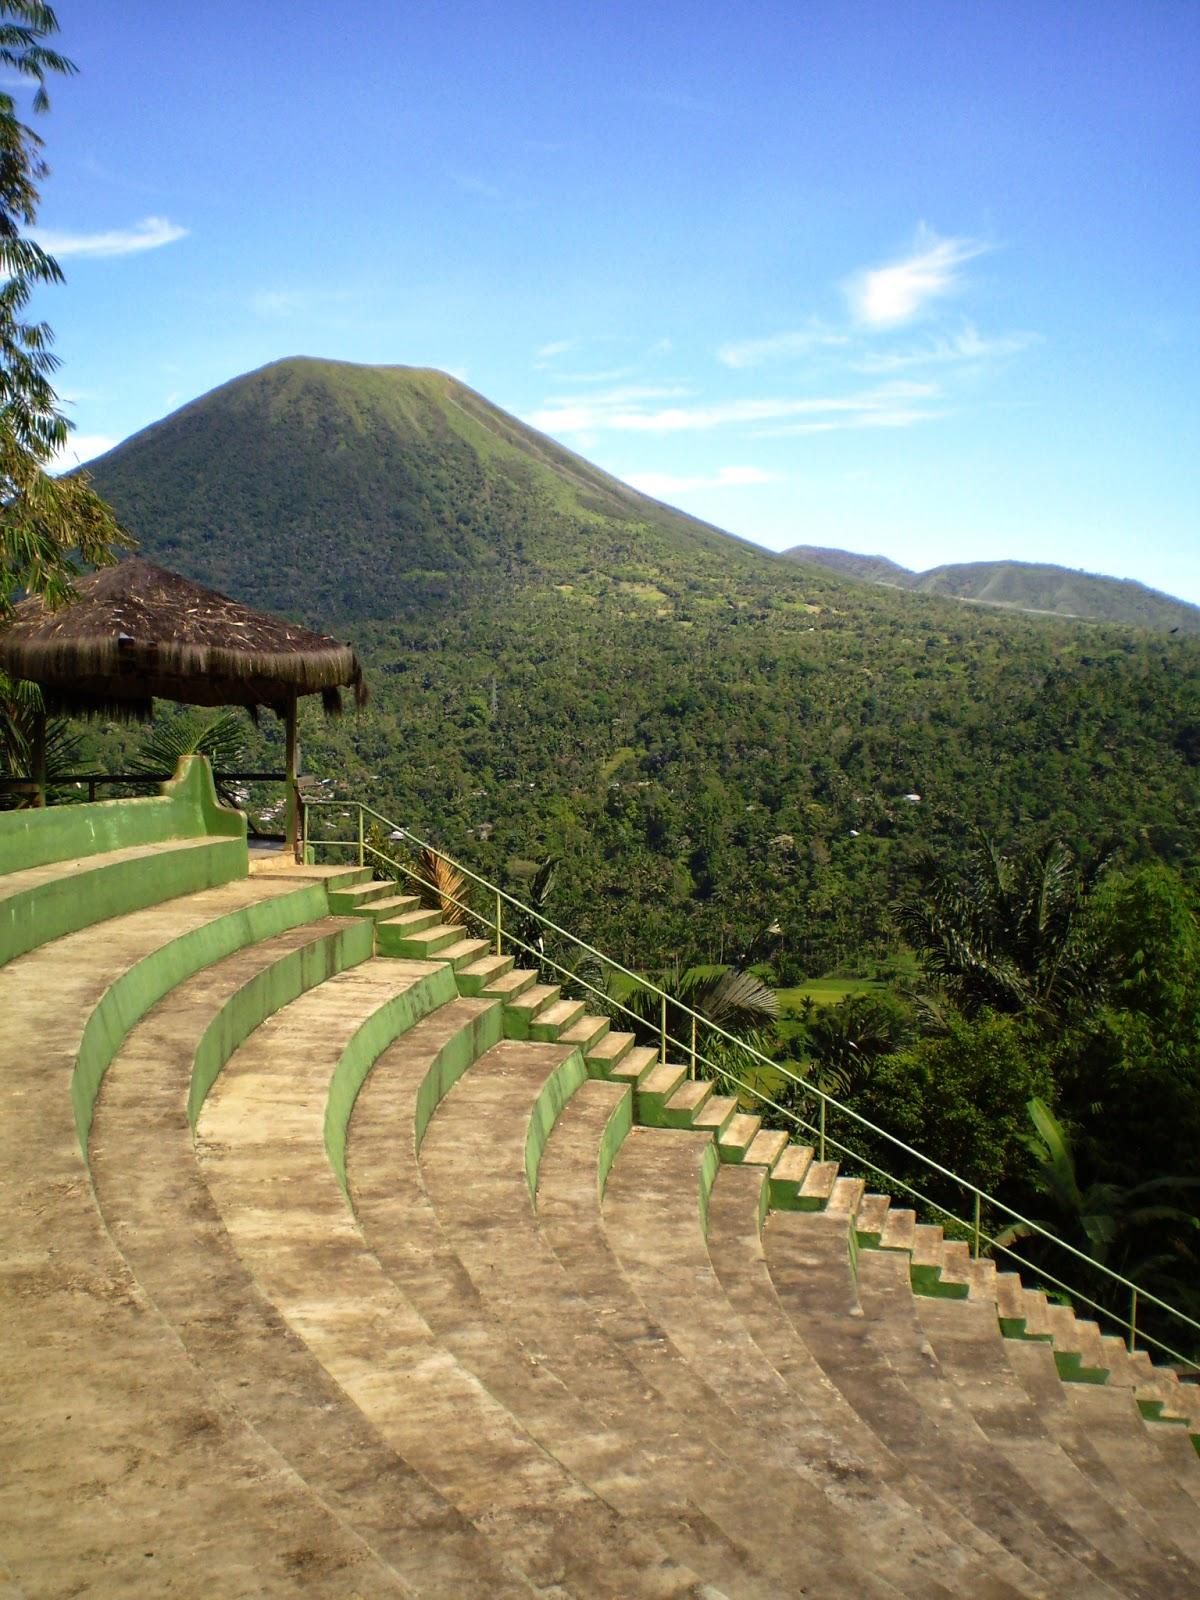 Tempat Wisata Di Tomohon : tempat, wisata, tomohon, Tempat, Wisata, Populer, Tomohon